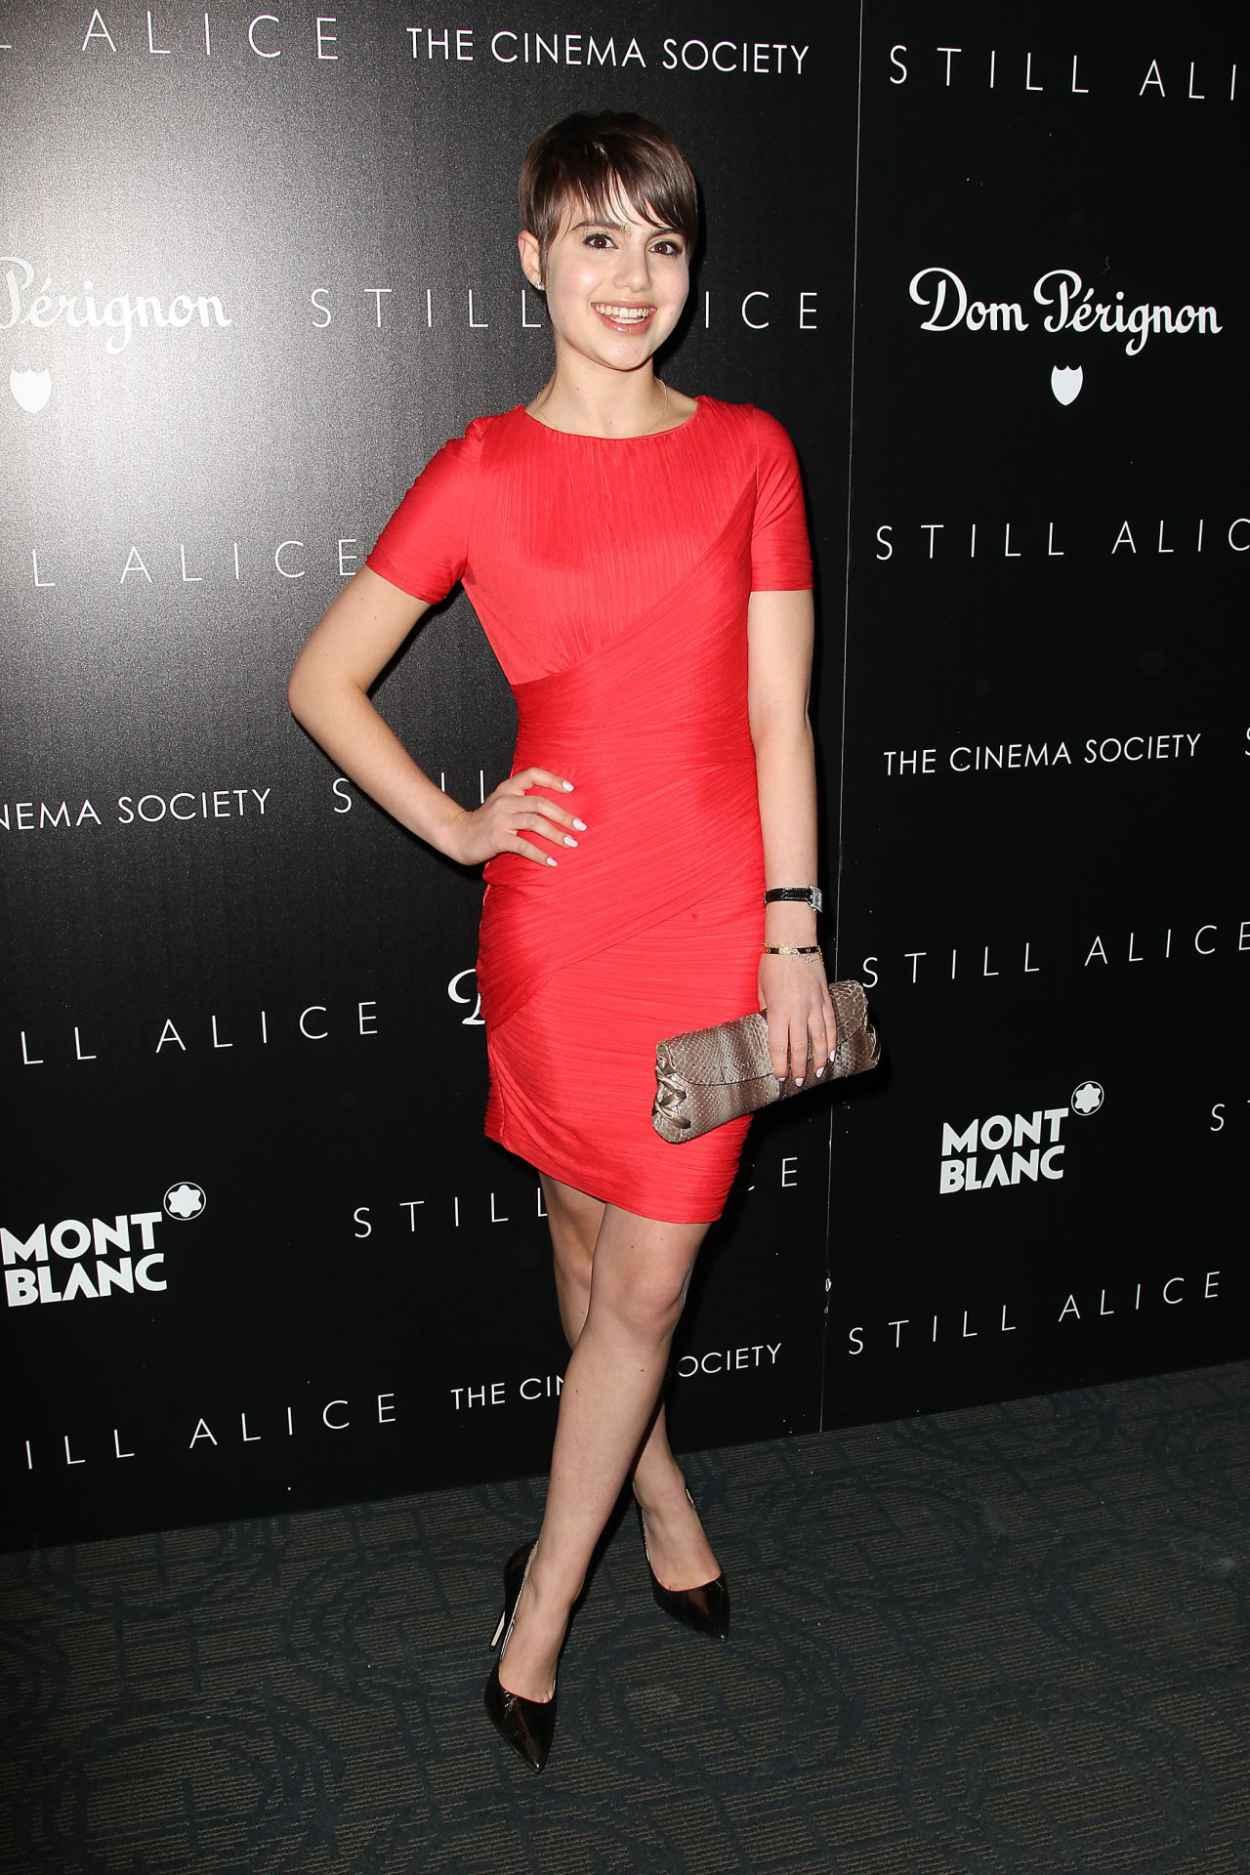 Sami Gayle in Red Dress - Still Alice Screening in New York City-3